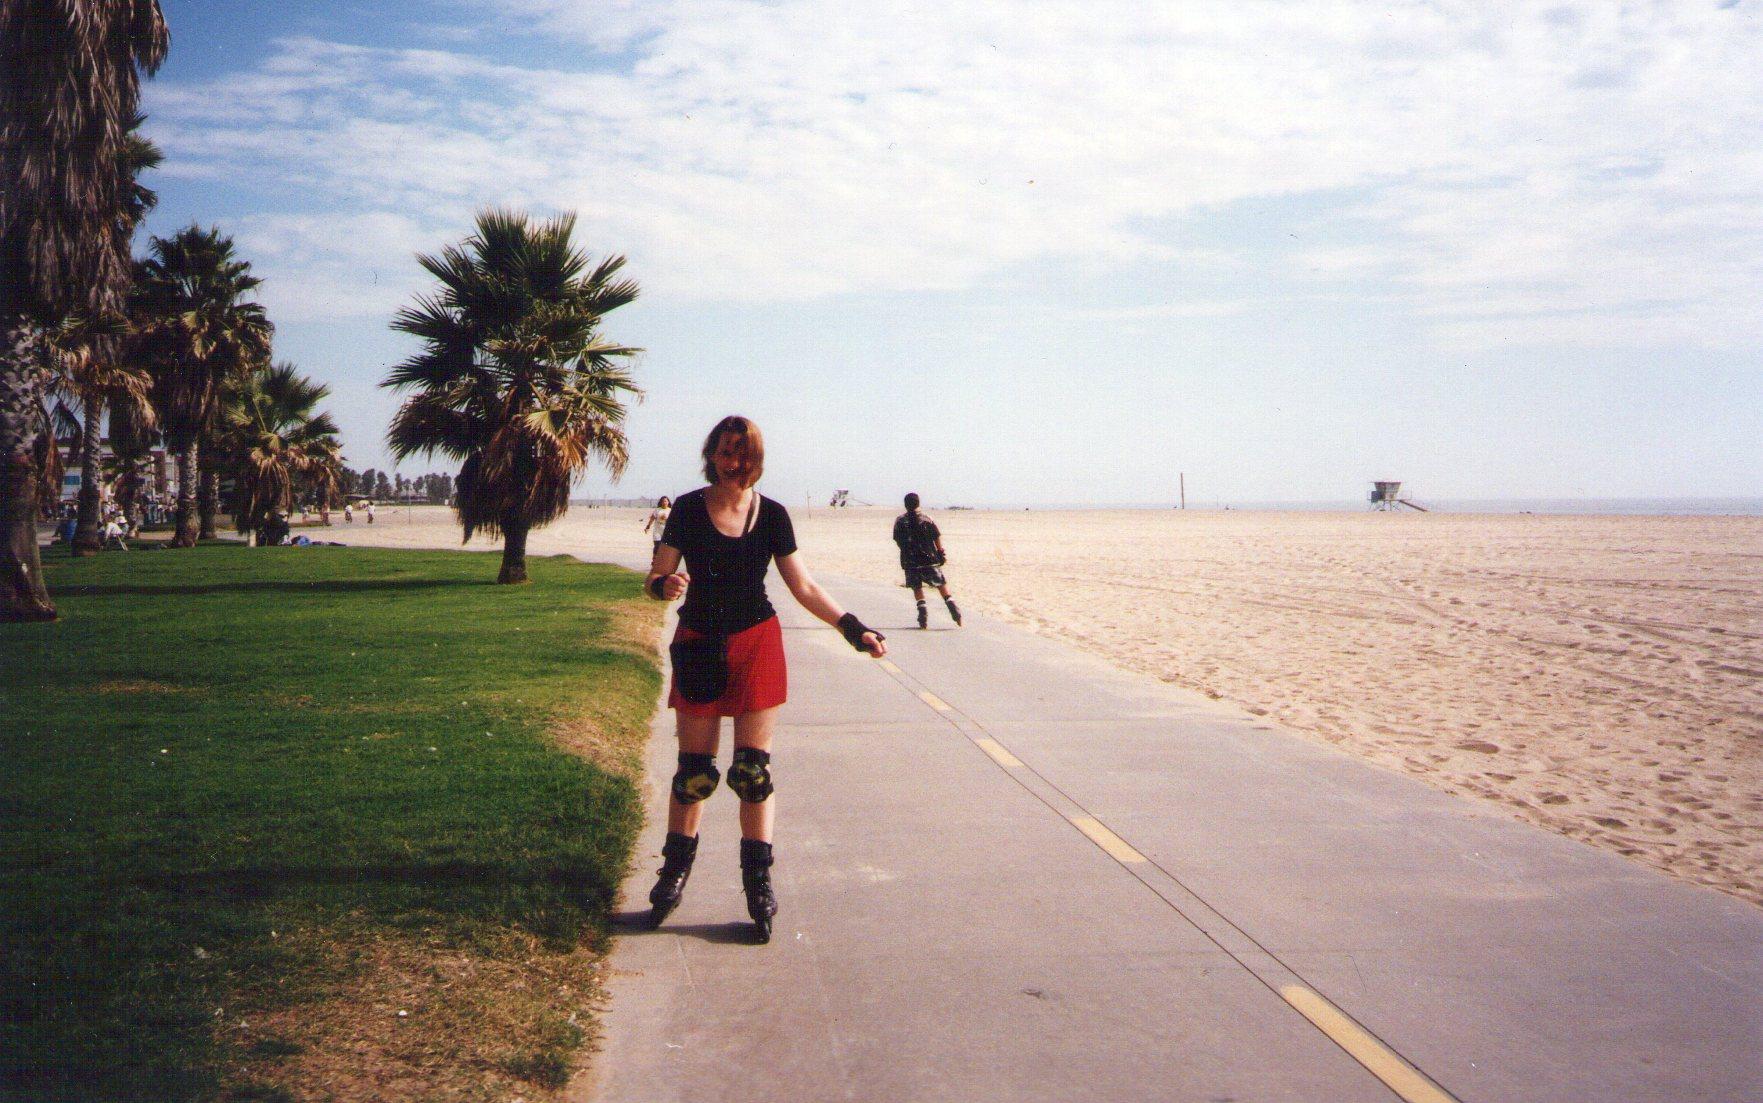 writer Ali Mercer rollerblading on Venice Beach California in the 90s